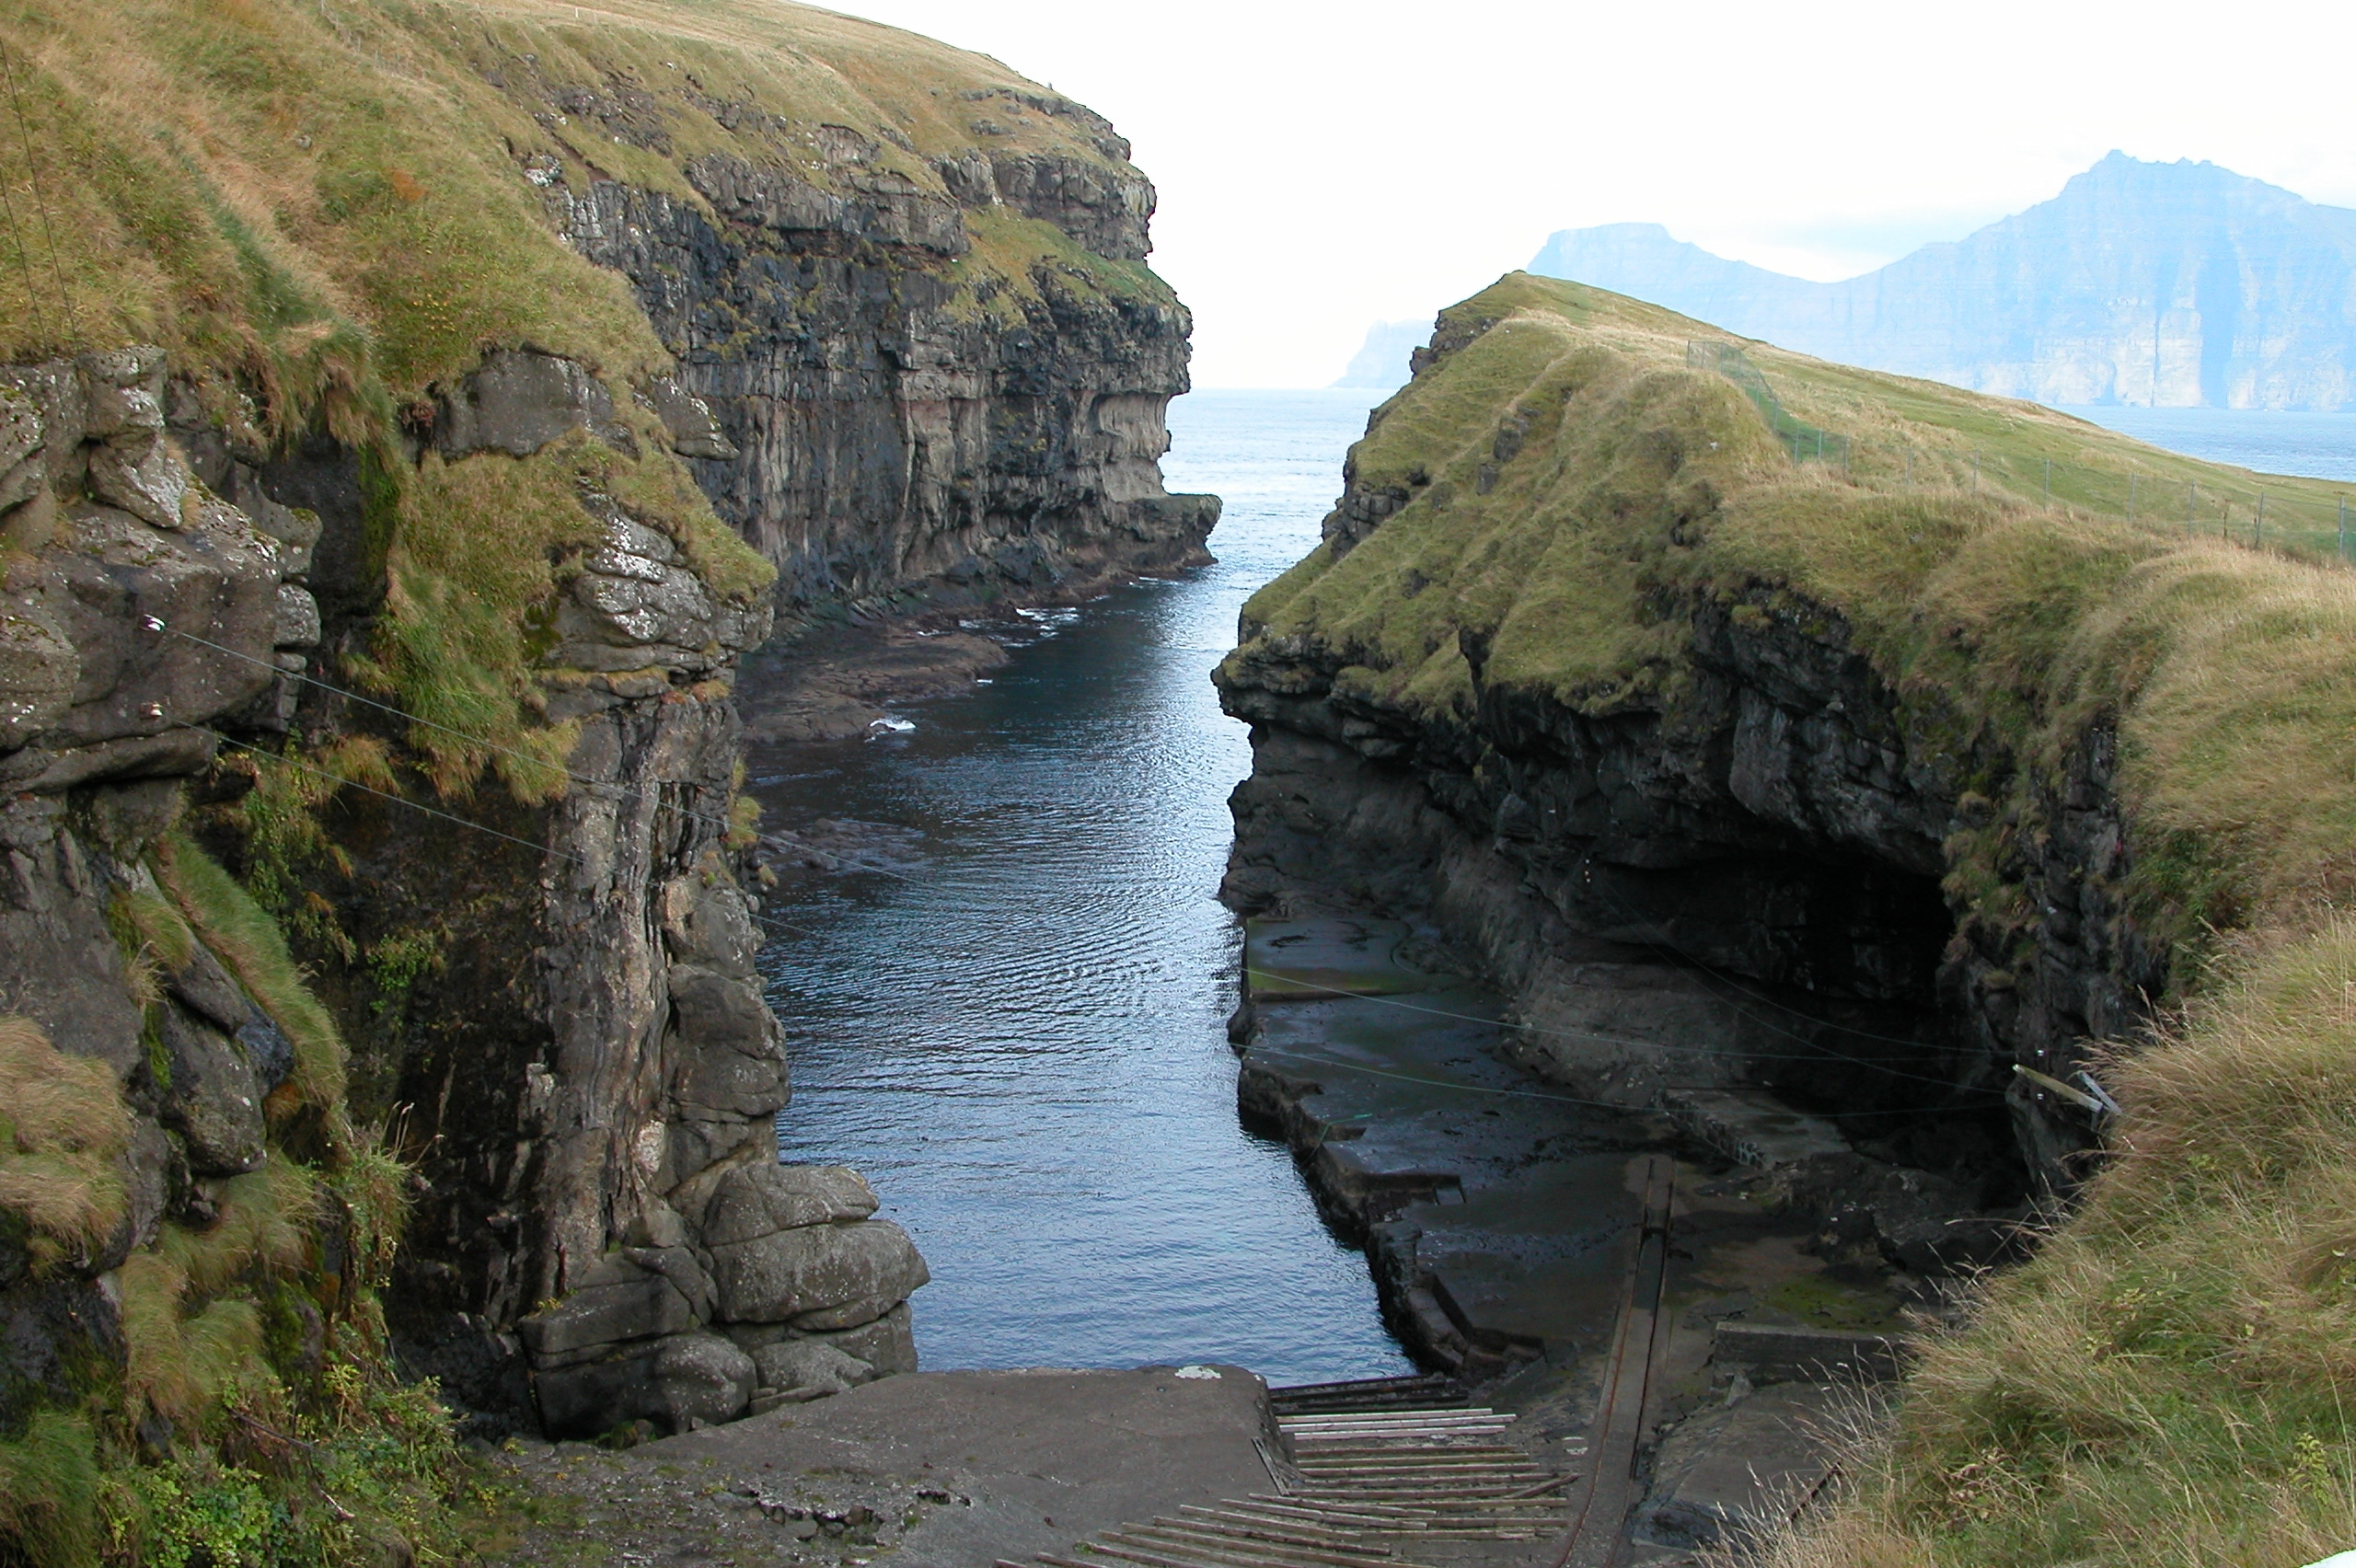 The gorge is the natural harbor of Gjógv, Faroe Islands. Photo taken on October 13, 2004.